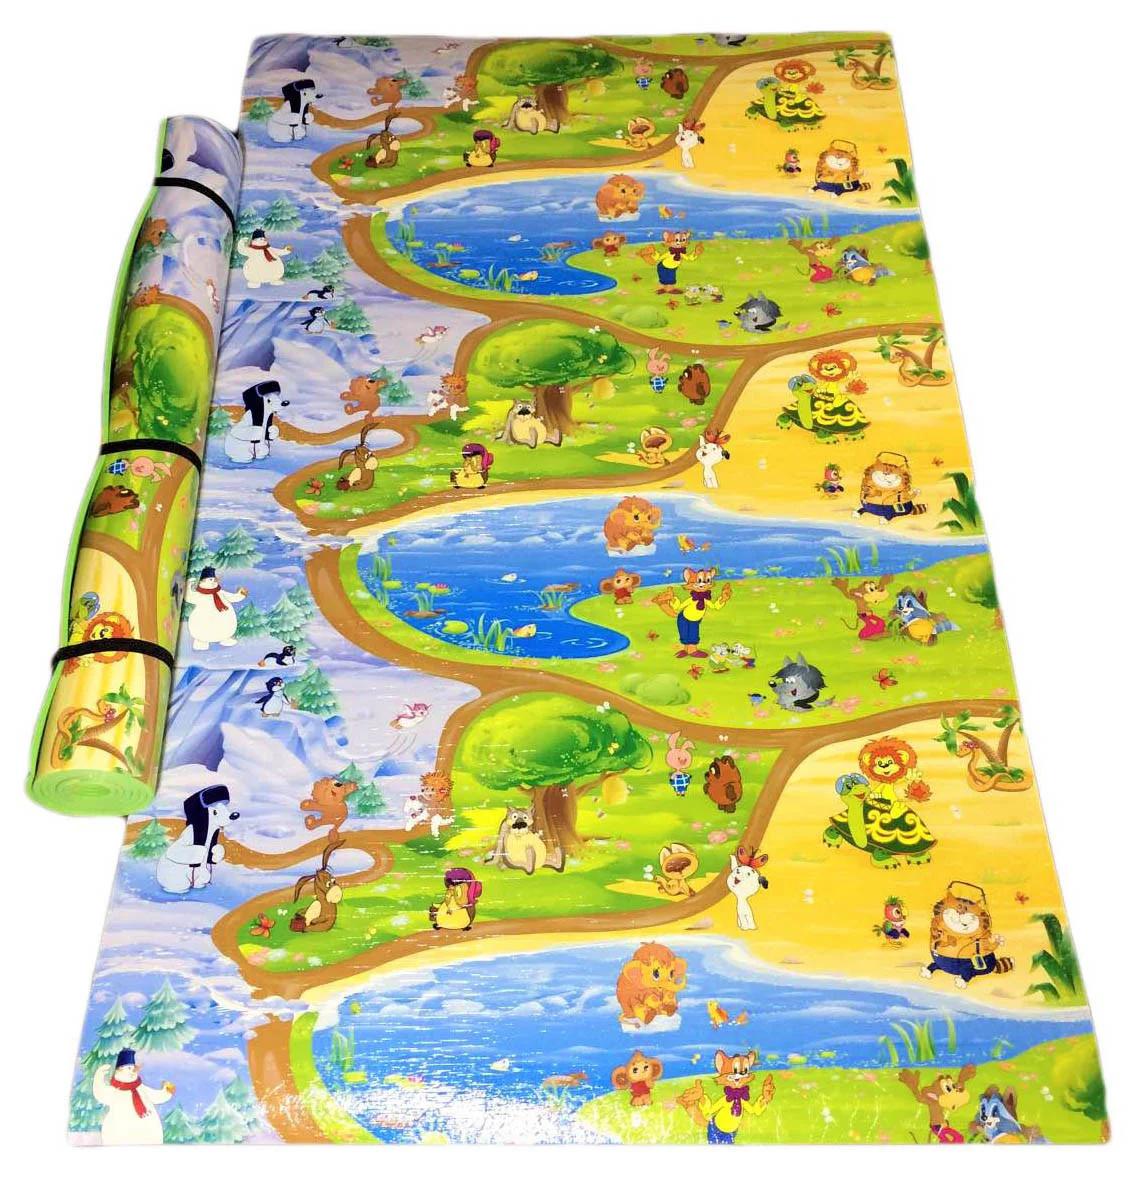 Детский коврик 2000х1200х11мм теплоизоляционный, развивающий, игровой коврик